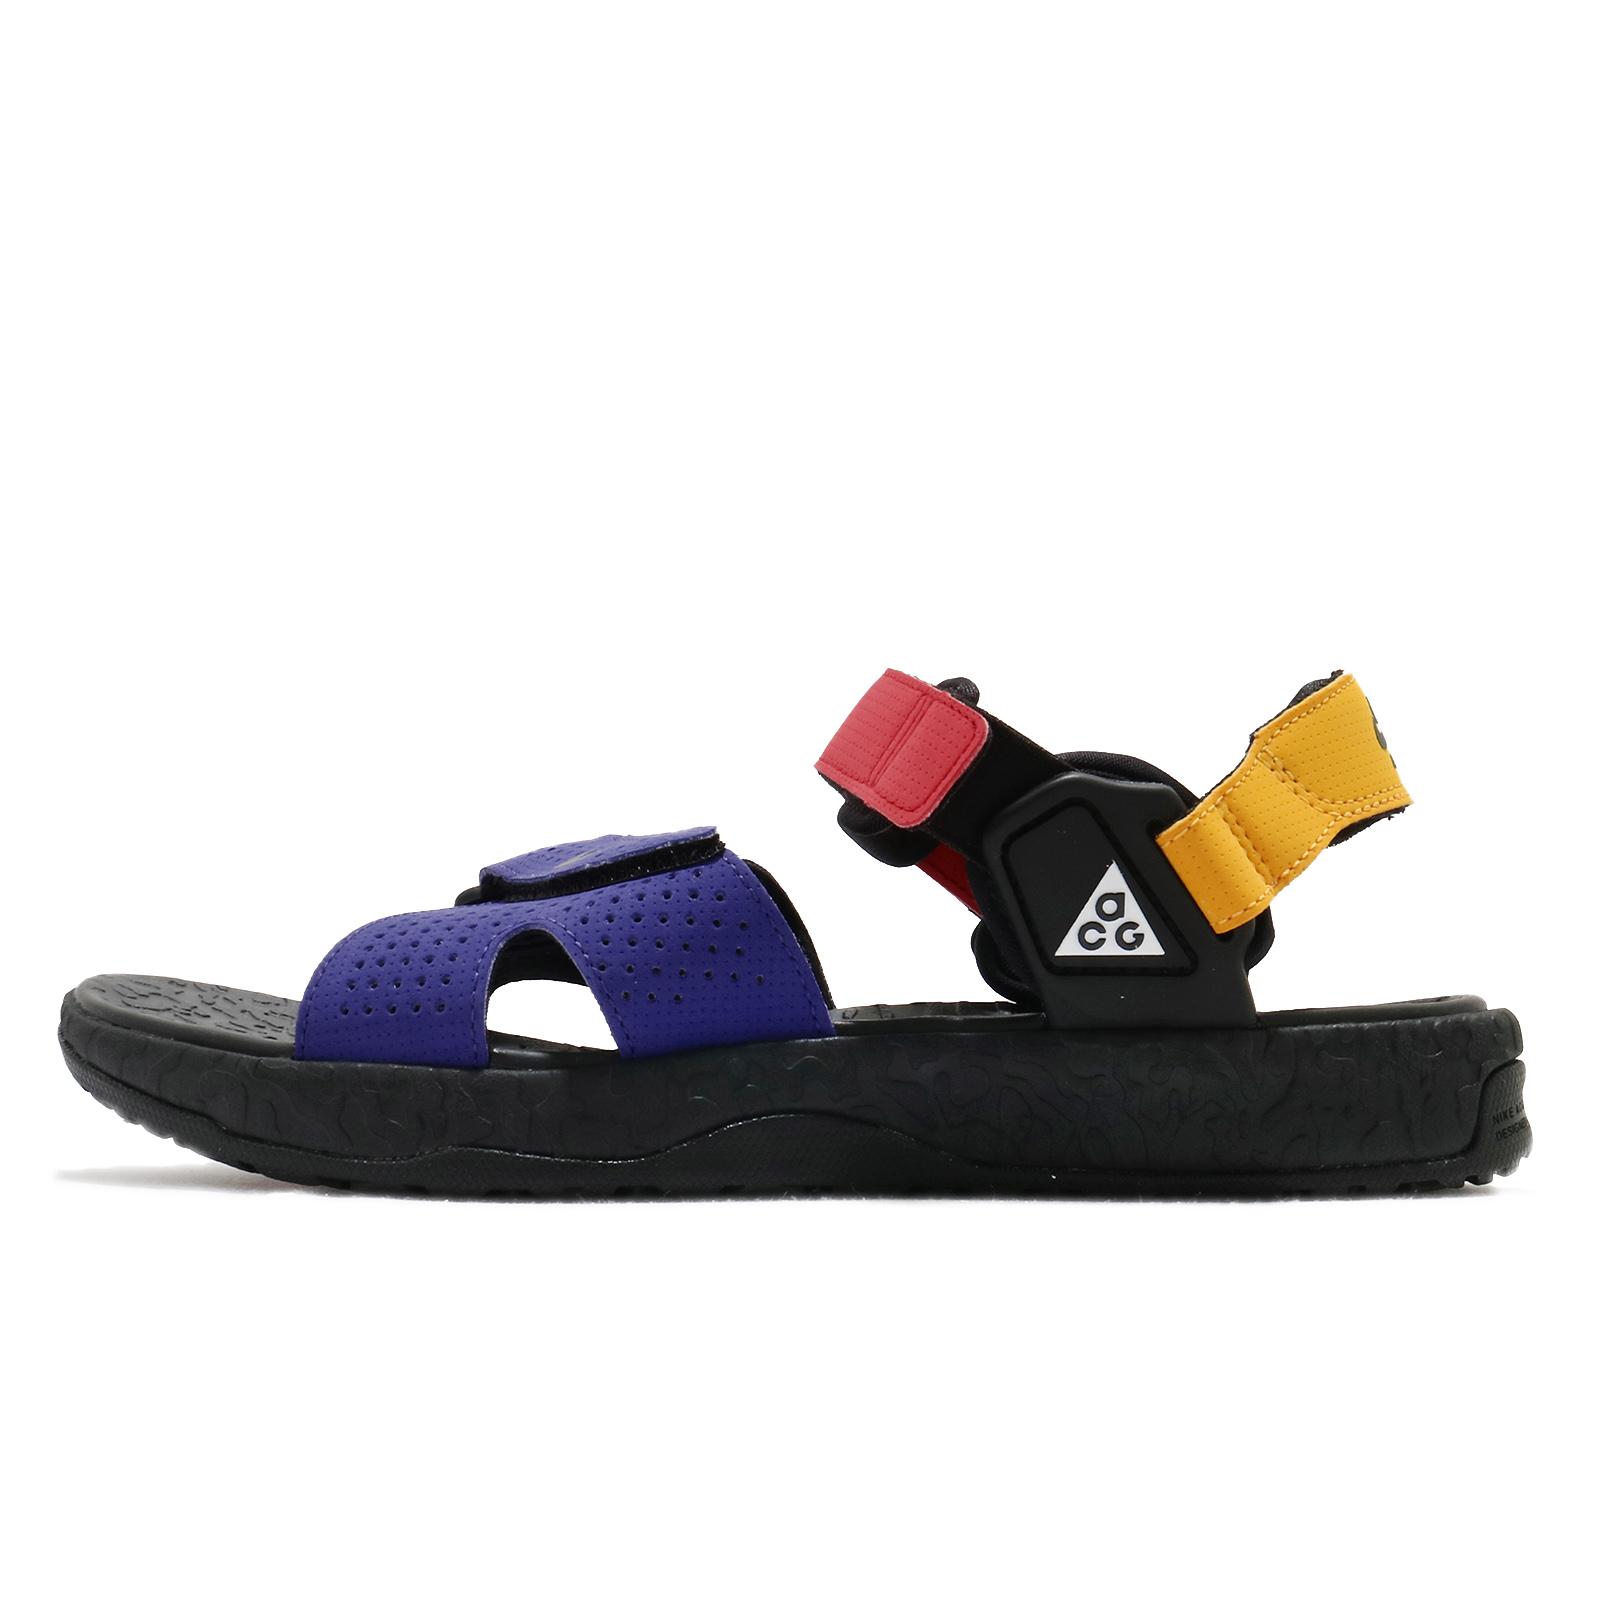 Nike 涼鞋 ACG Deschutz 藍 紅 黃 黑 戶外風格 魔鬼氈 男鞋 女鞋 【ACS】 CT3303-400